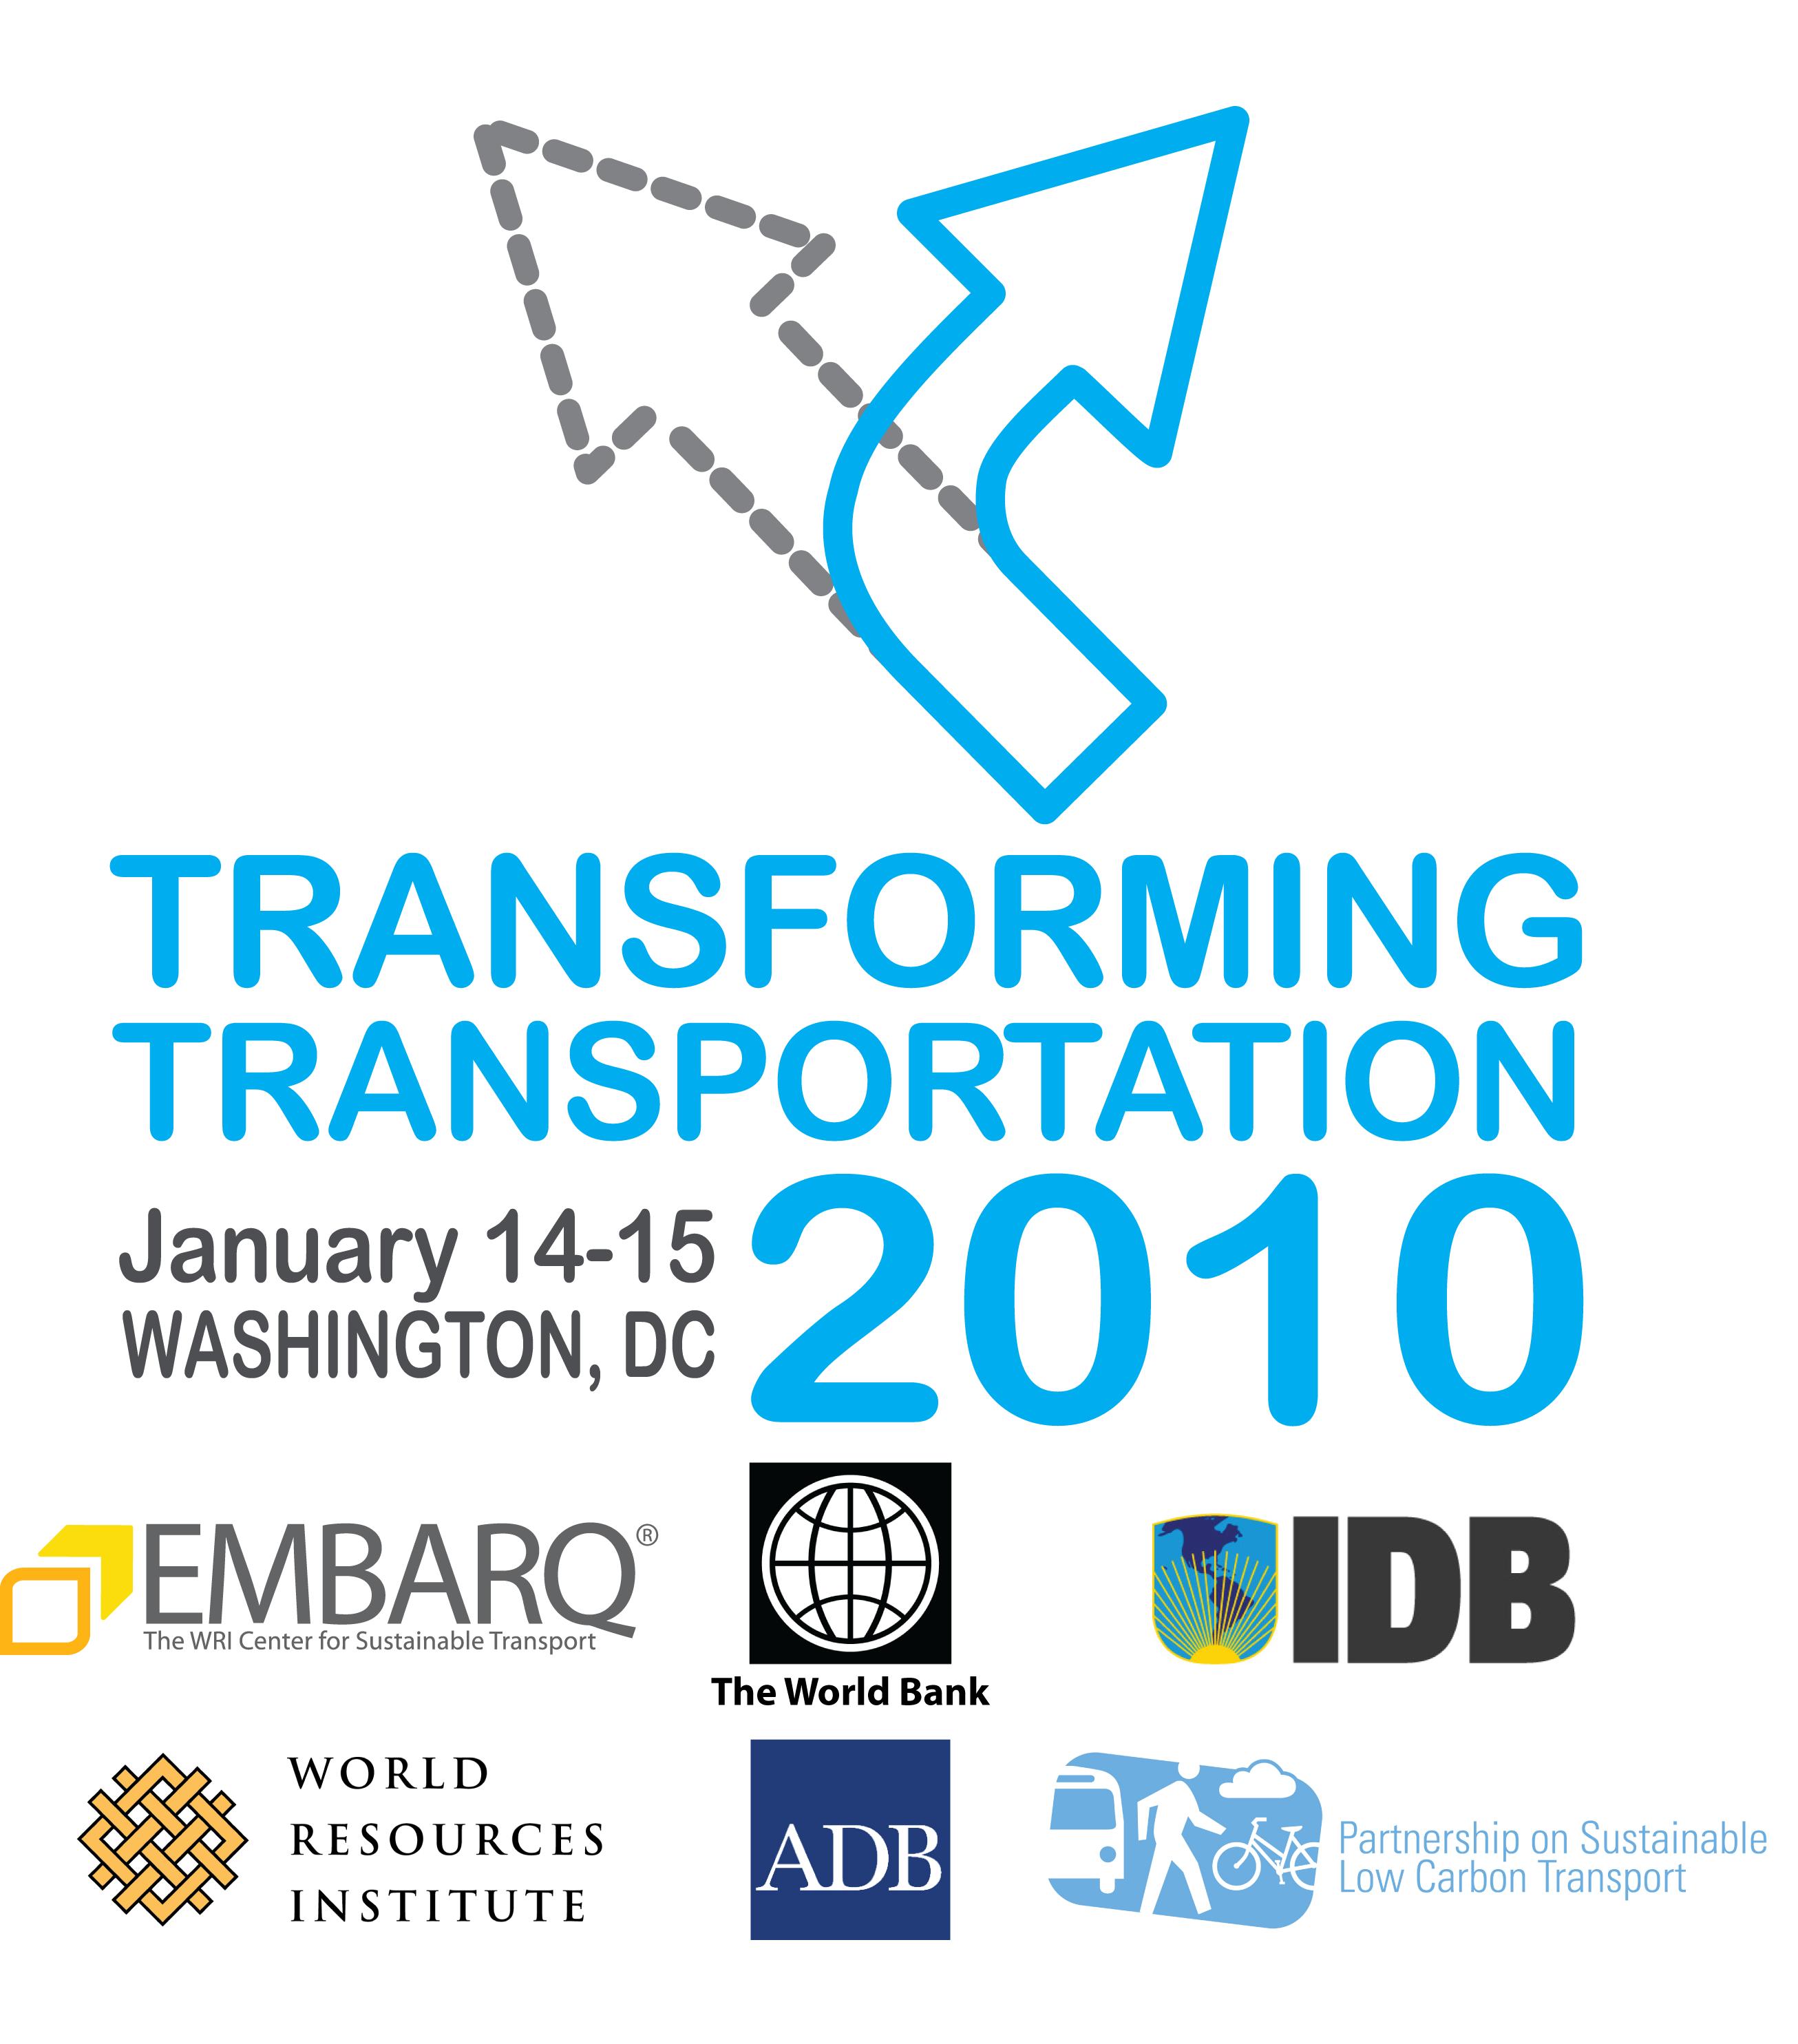 TT2010-logo-with-partners